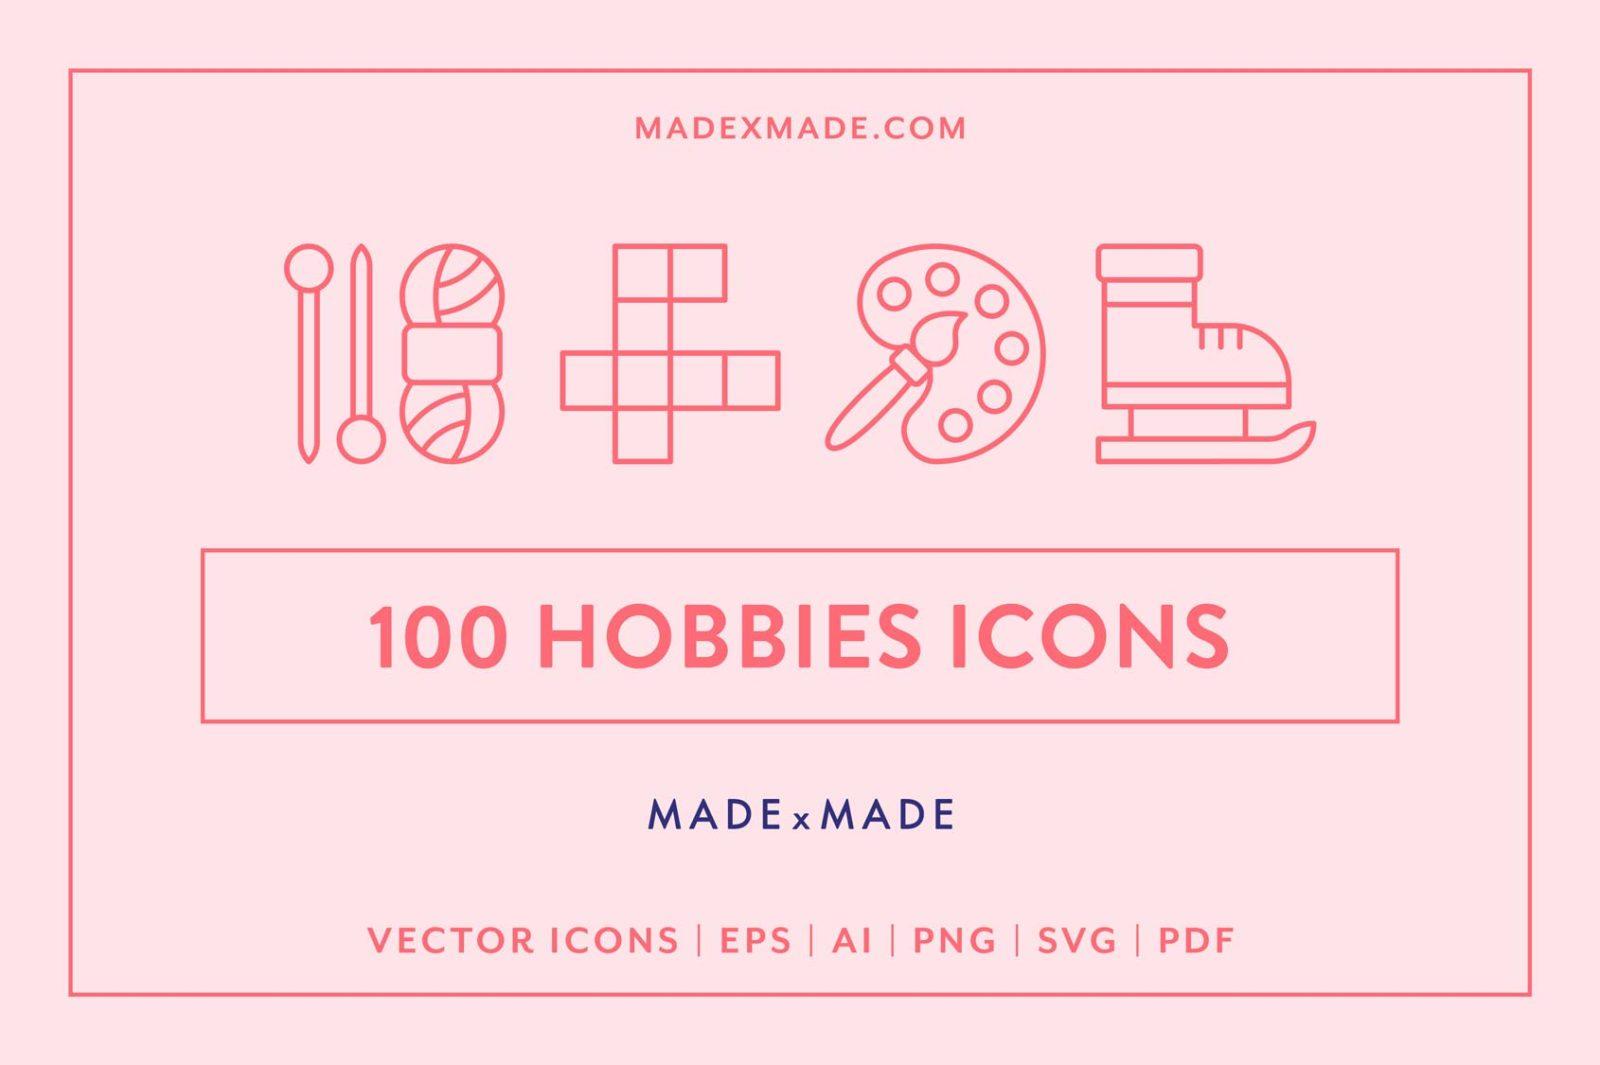 made x made icons hobbies